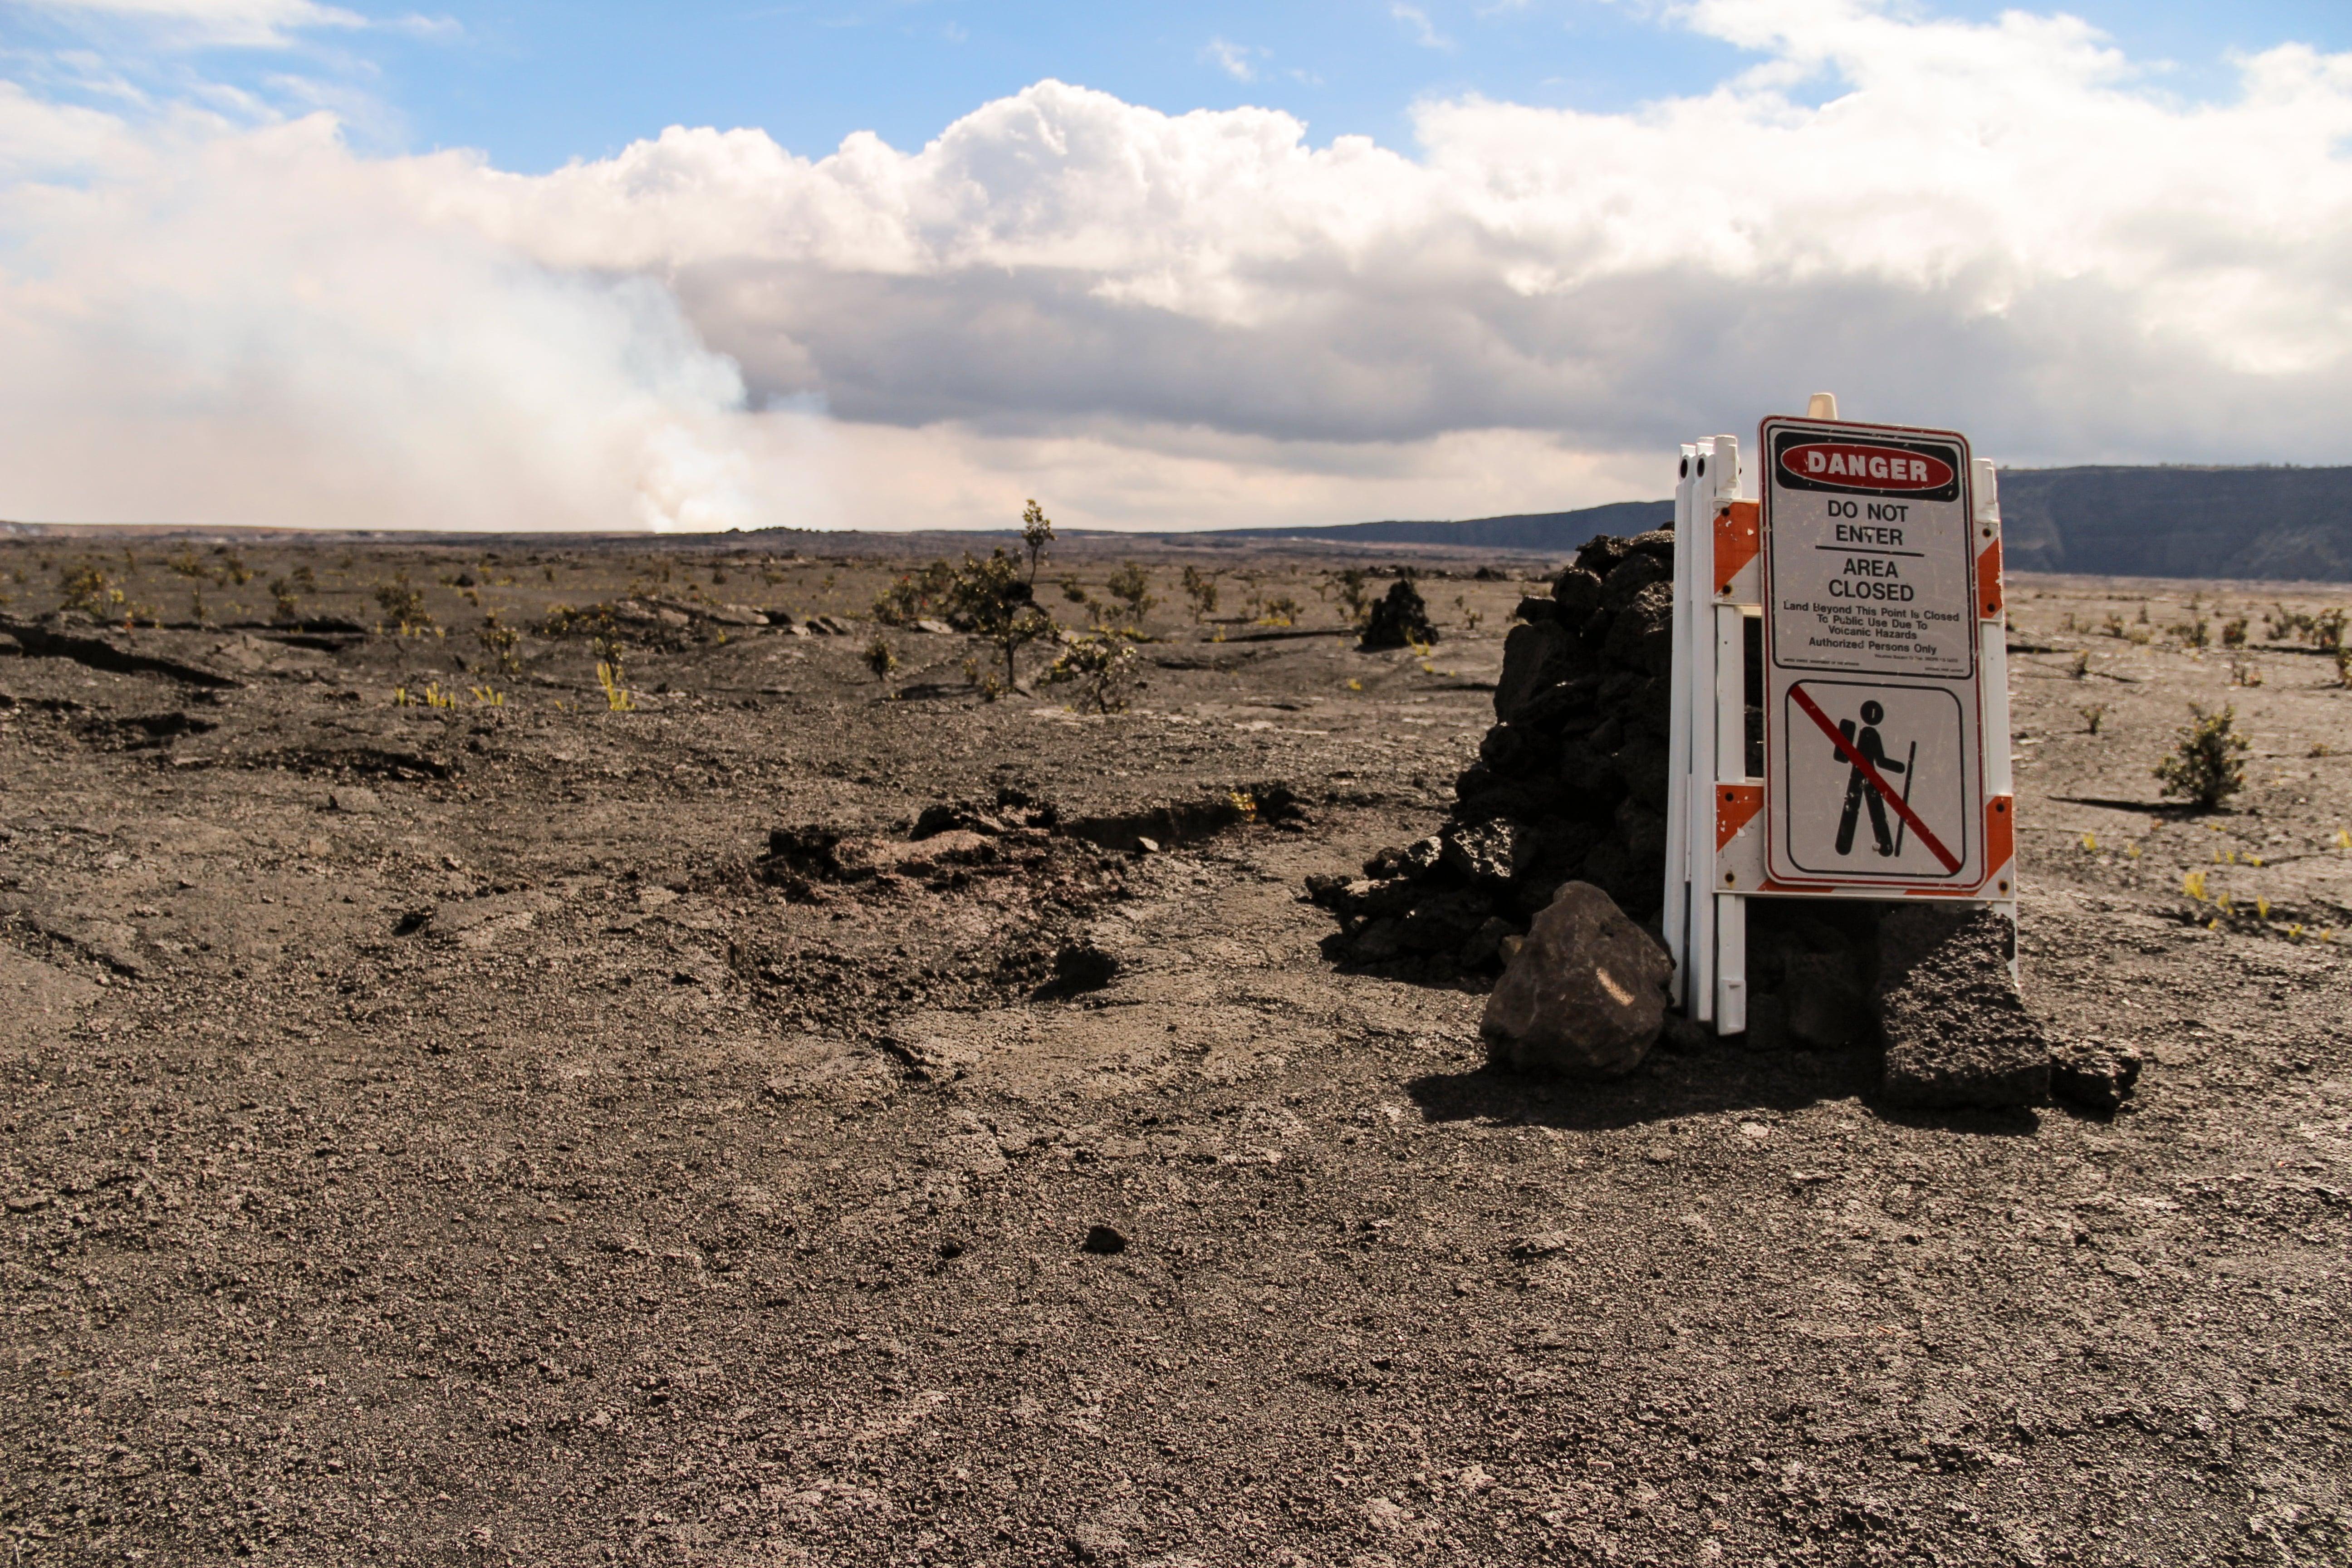 Danger do not enter area close sign, Kilauea crater